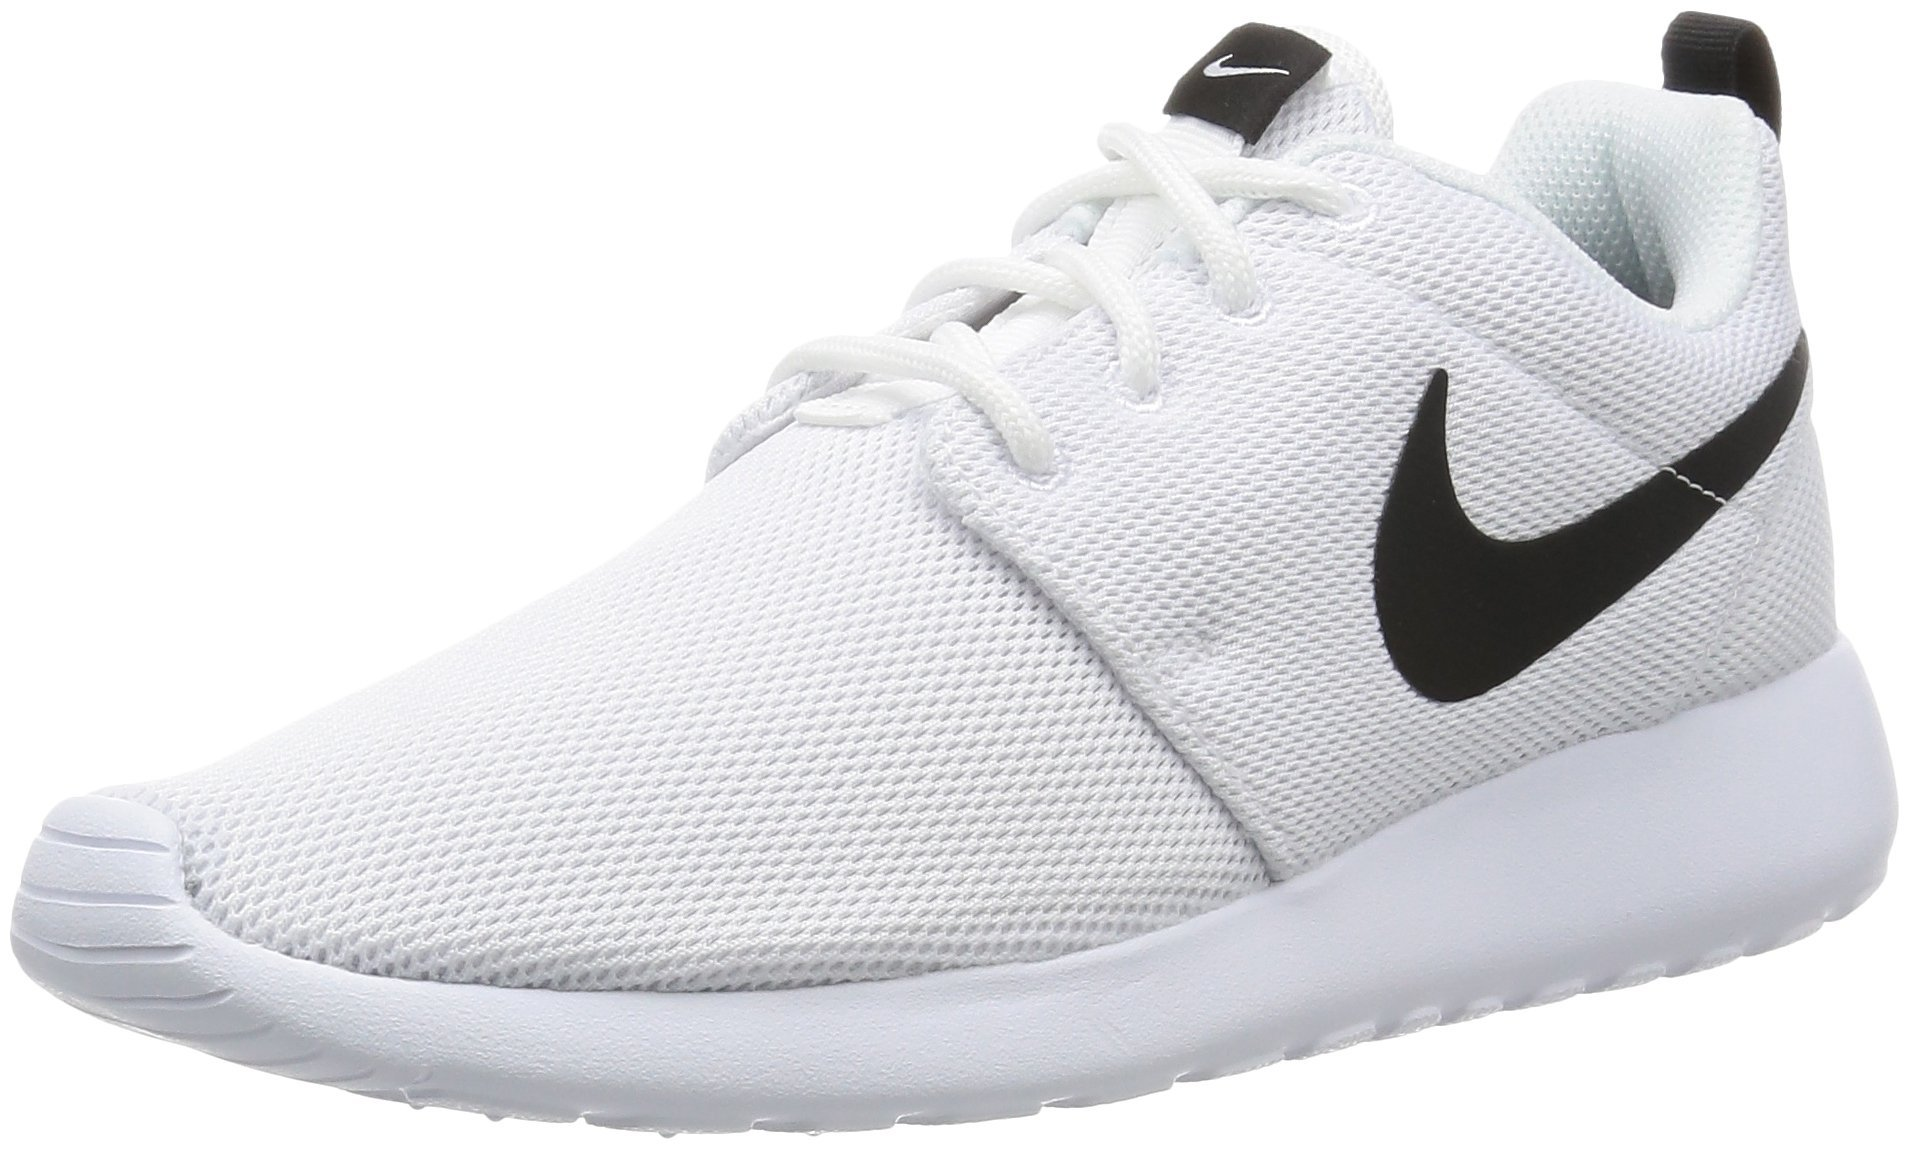 Nike Womens Roshe One Running Shoes (8.5 B(M) US)(White/White/Black)